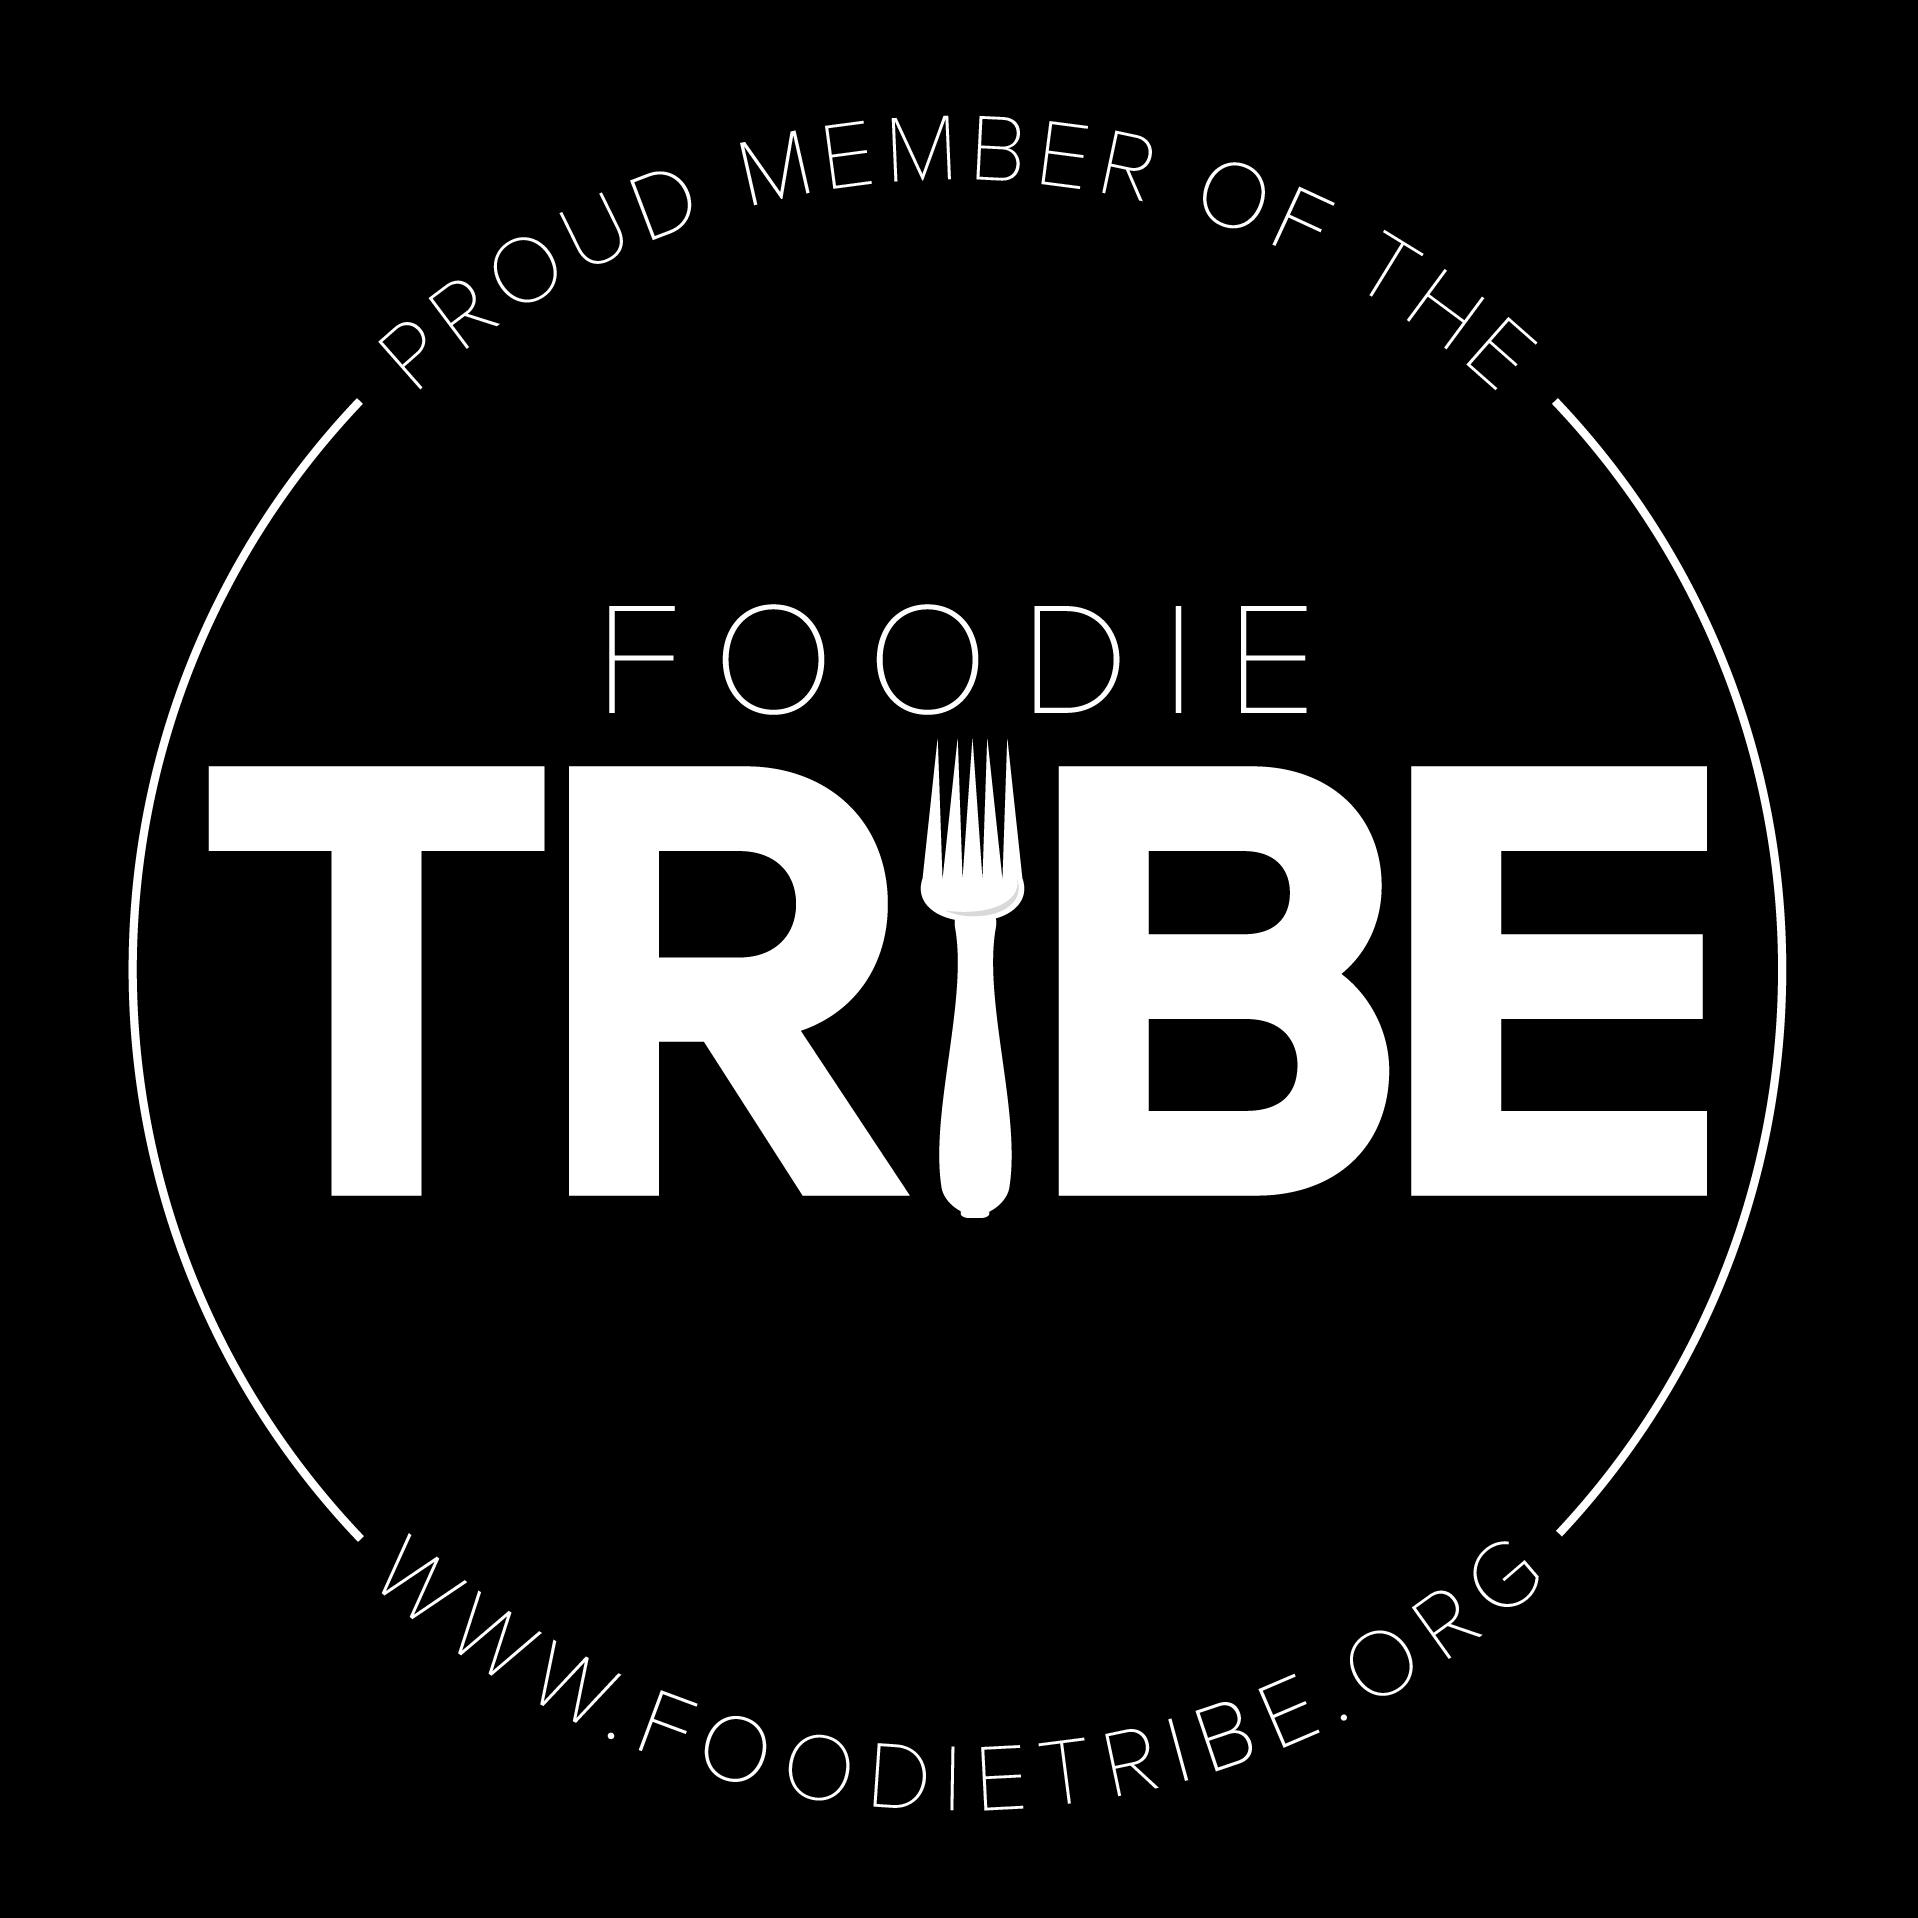 FoodieTribeBadge